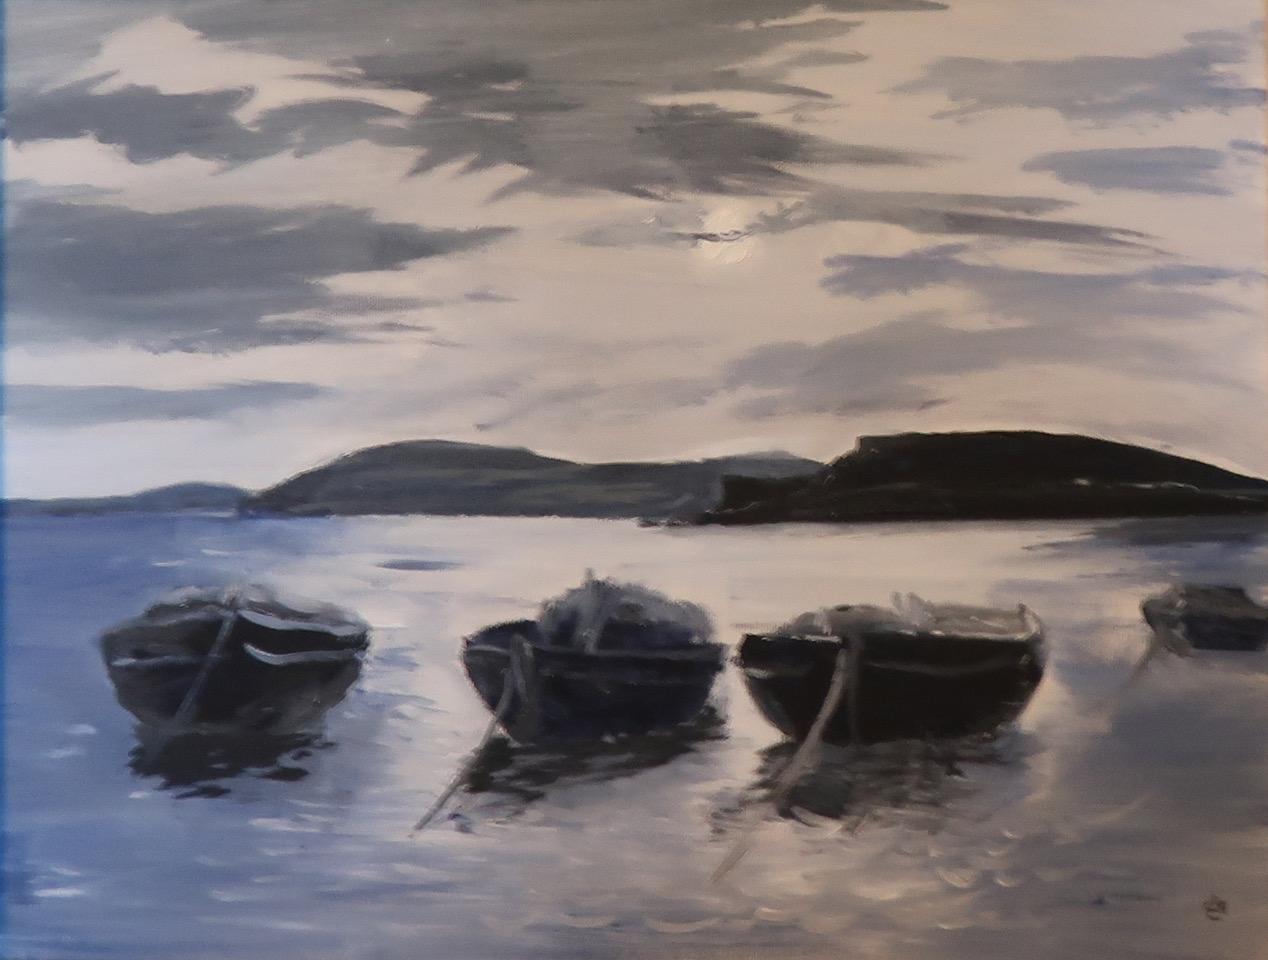 Boats in moon light